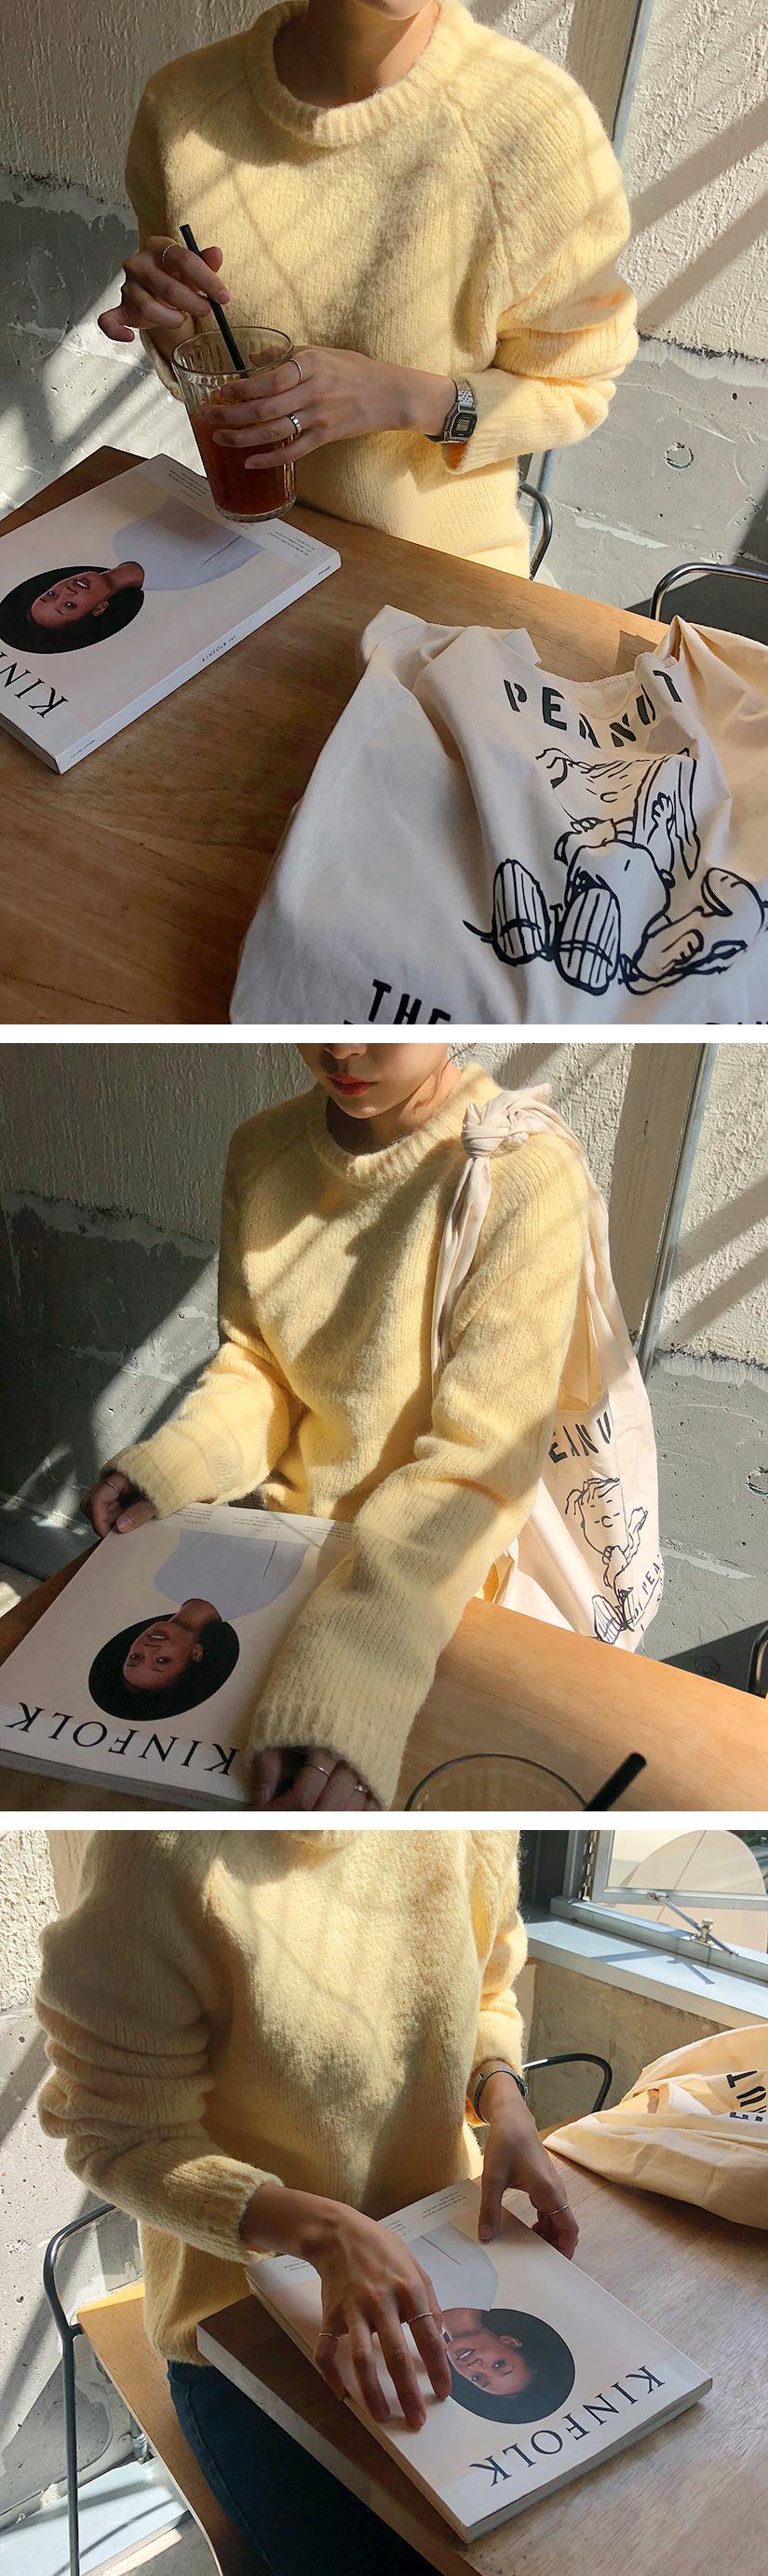 Merci color alpaca knit_M (size : free)[예약발송 : 10월 중순 입고]